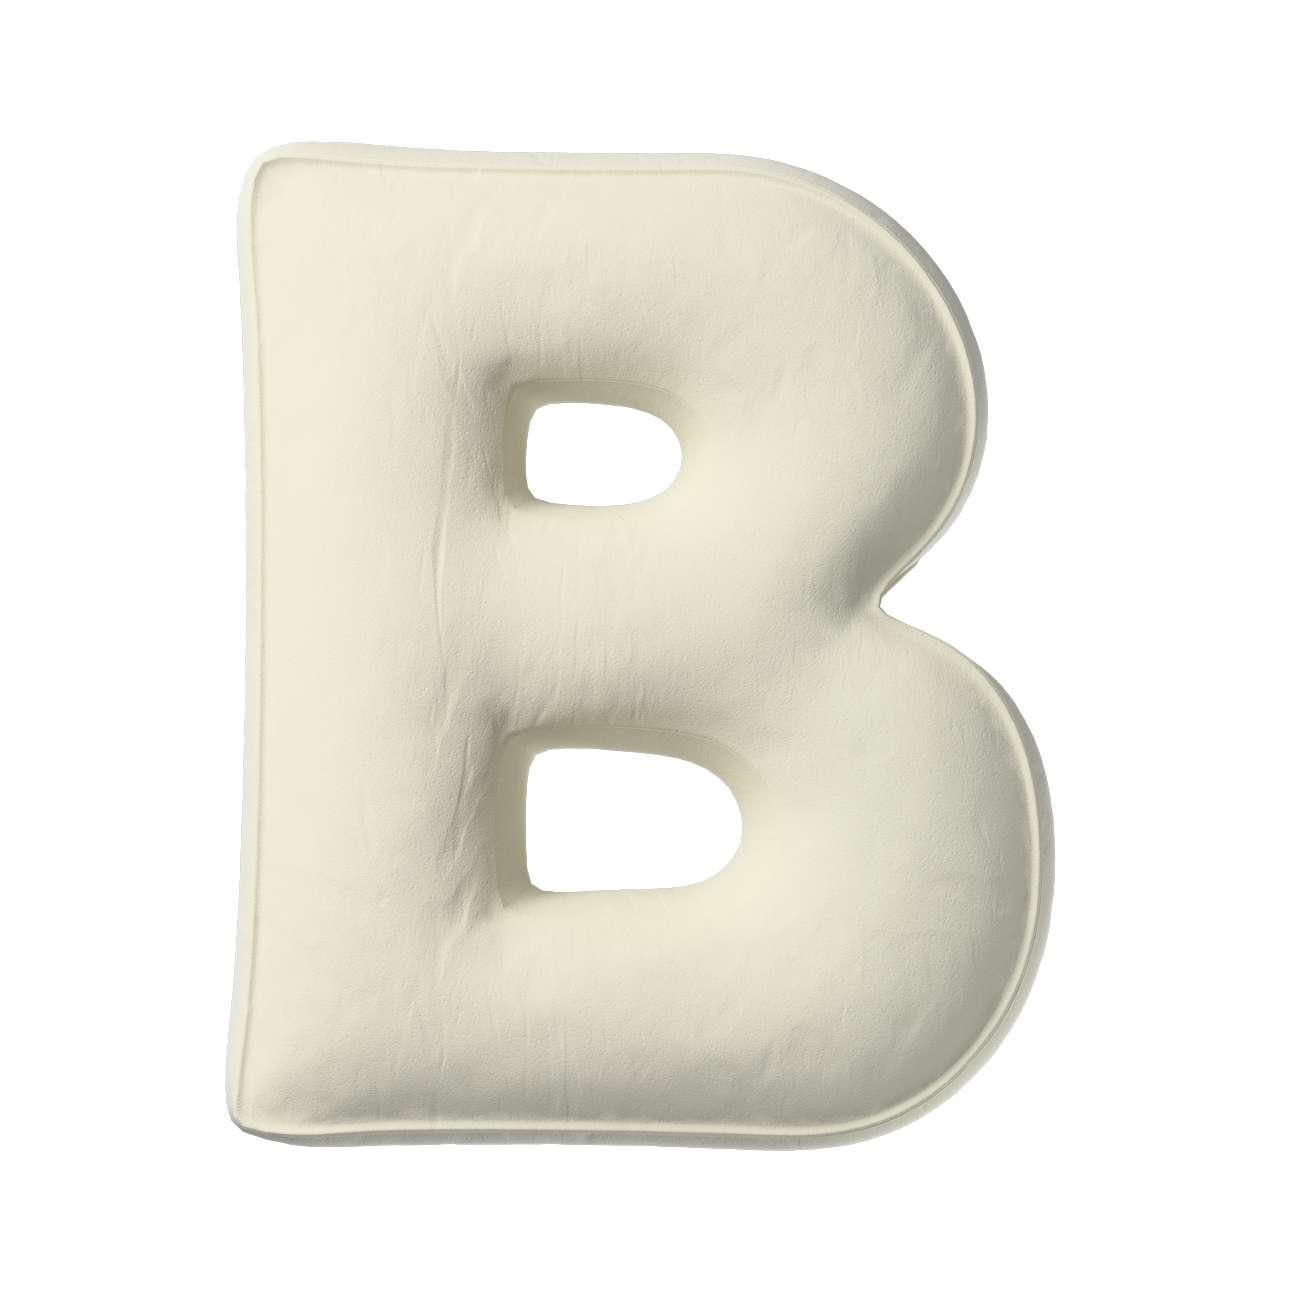 Polštář písmenko B v kolekci Posh Velvet, látka: 704-10